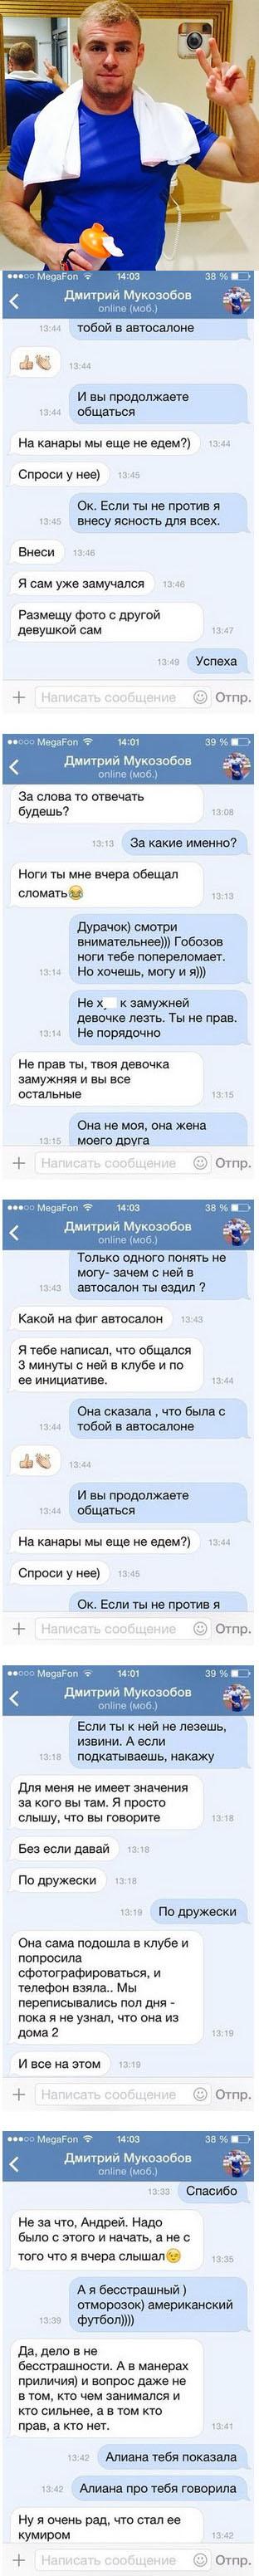 Переписка Андрея Черкасова и Дмитрия Мукозубова